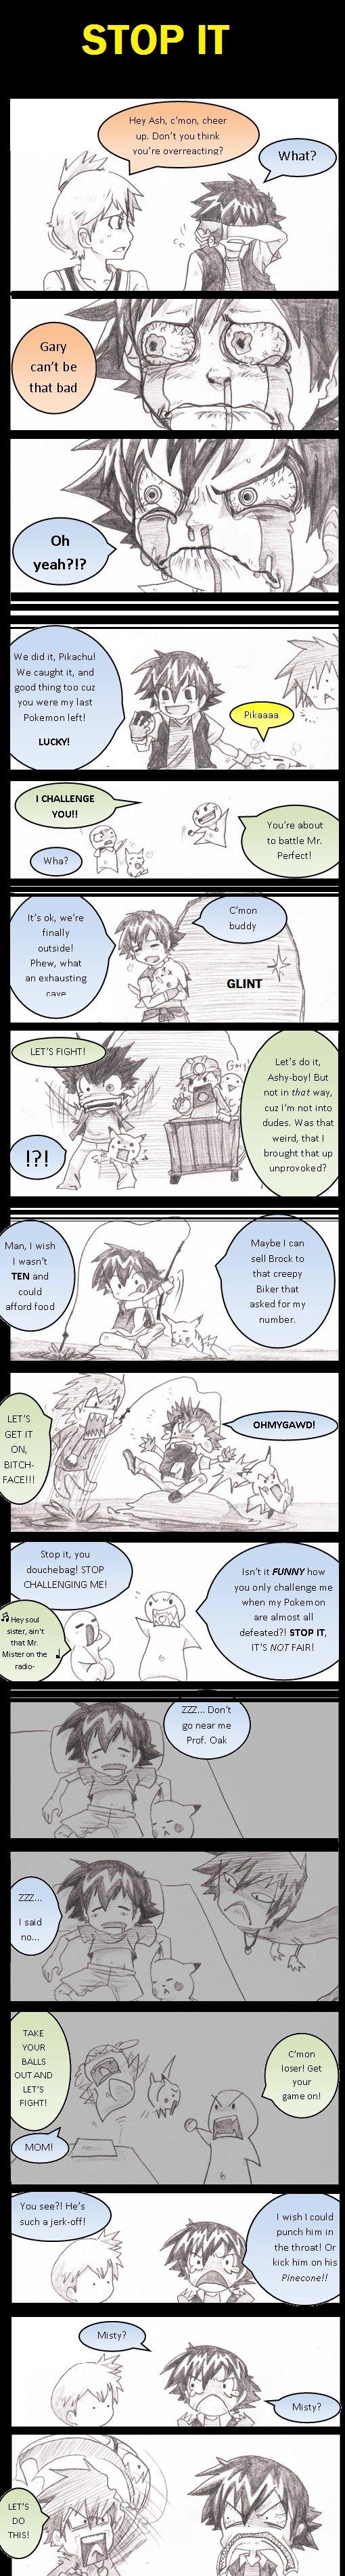 Damn you Gary!. Pokemon!.